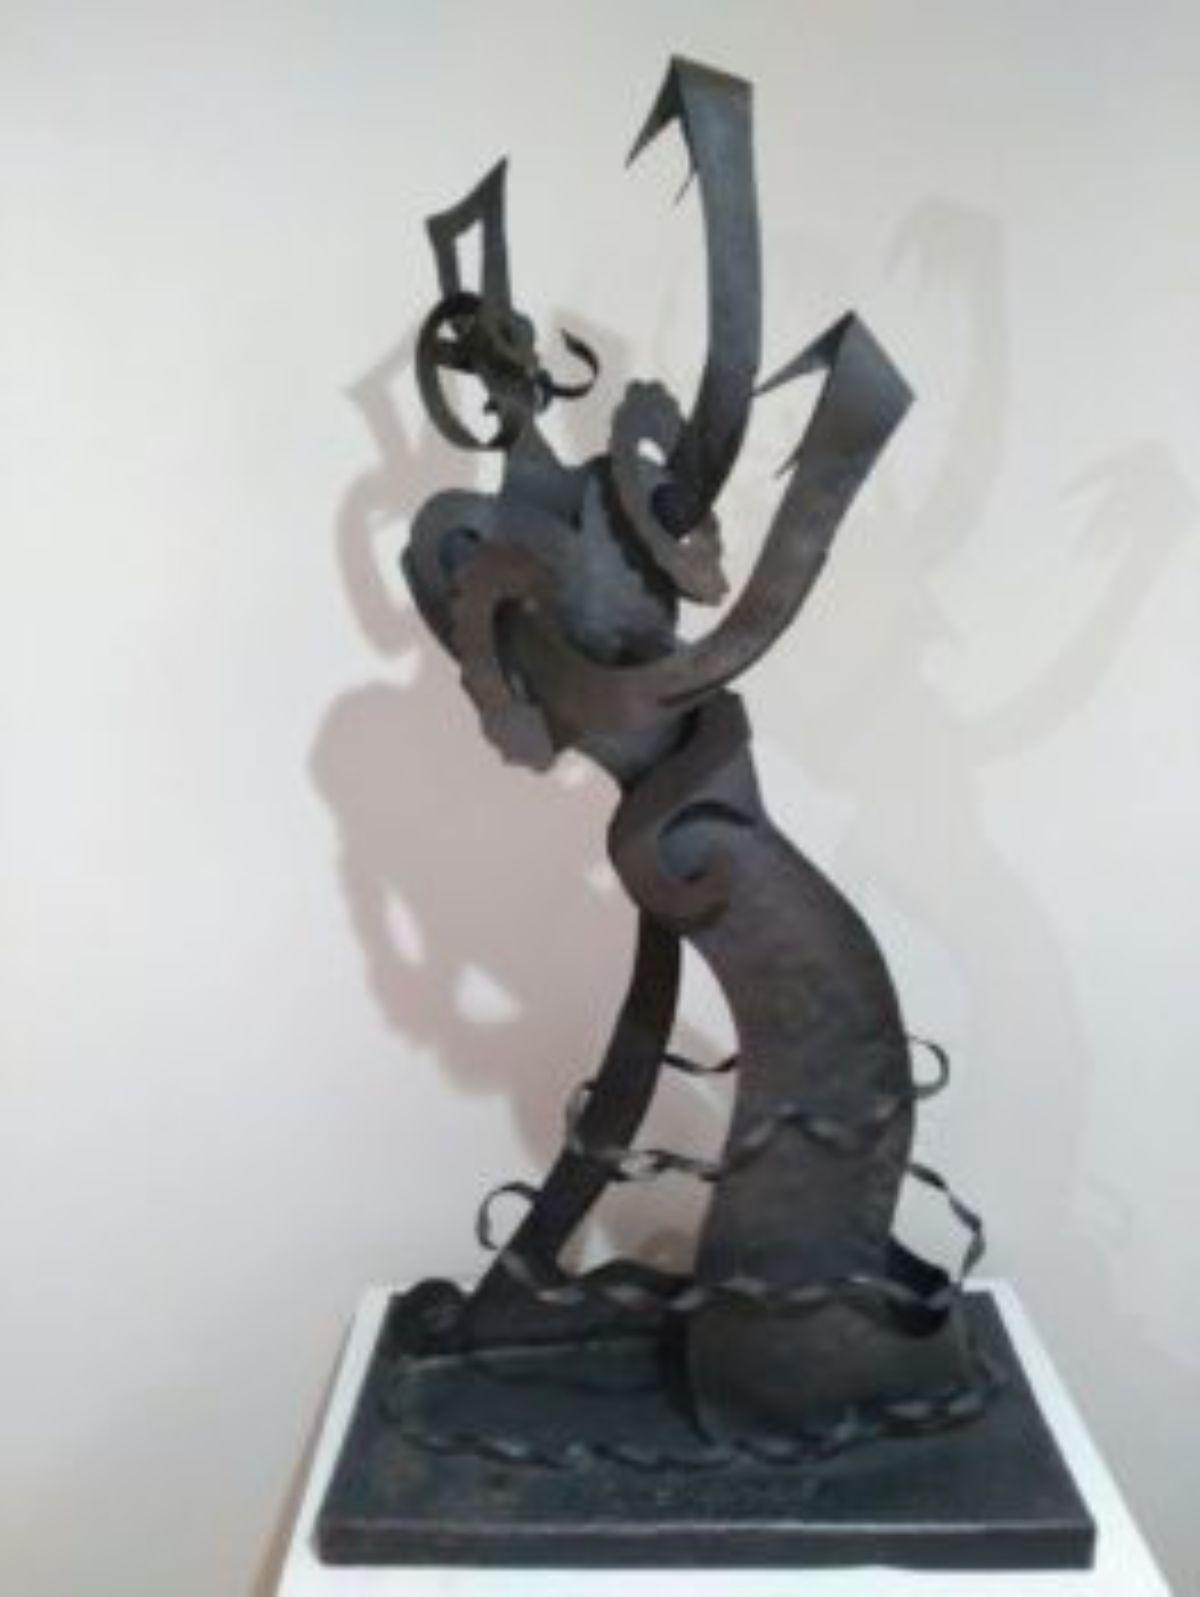 La obra bailarina de Blasco Ferrer./ B. Severino.